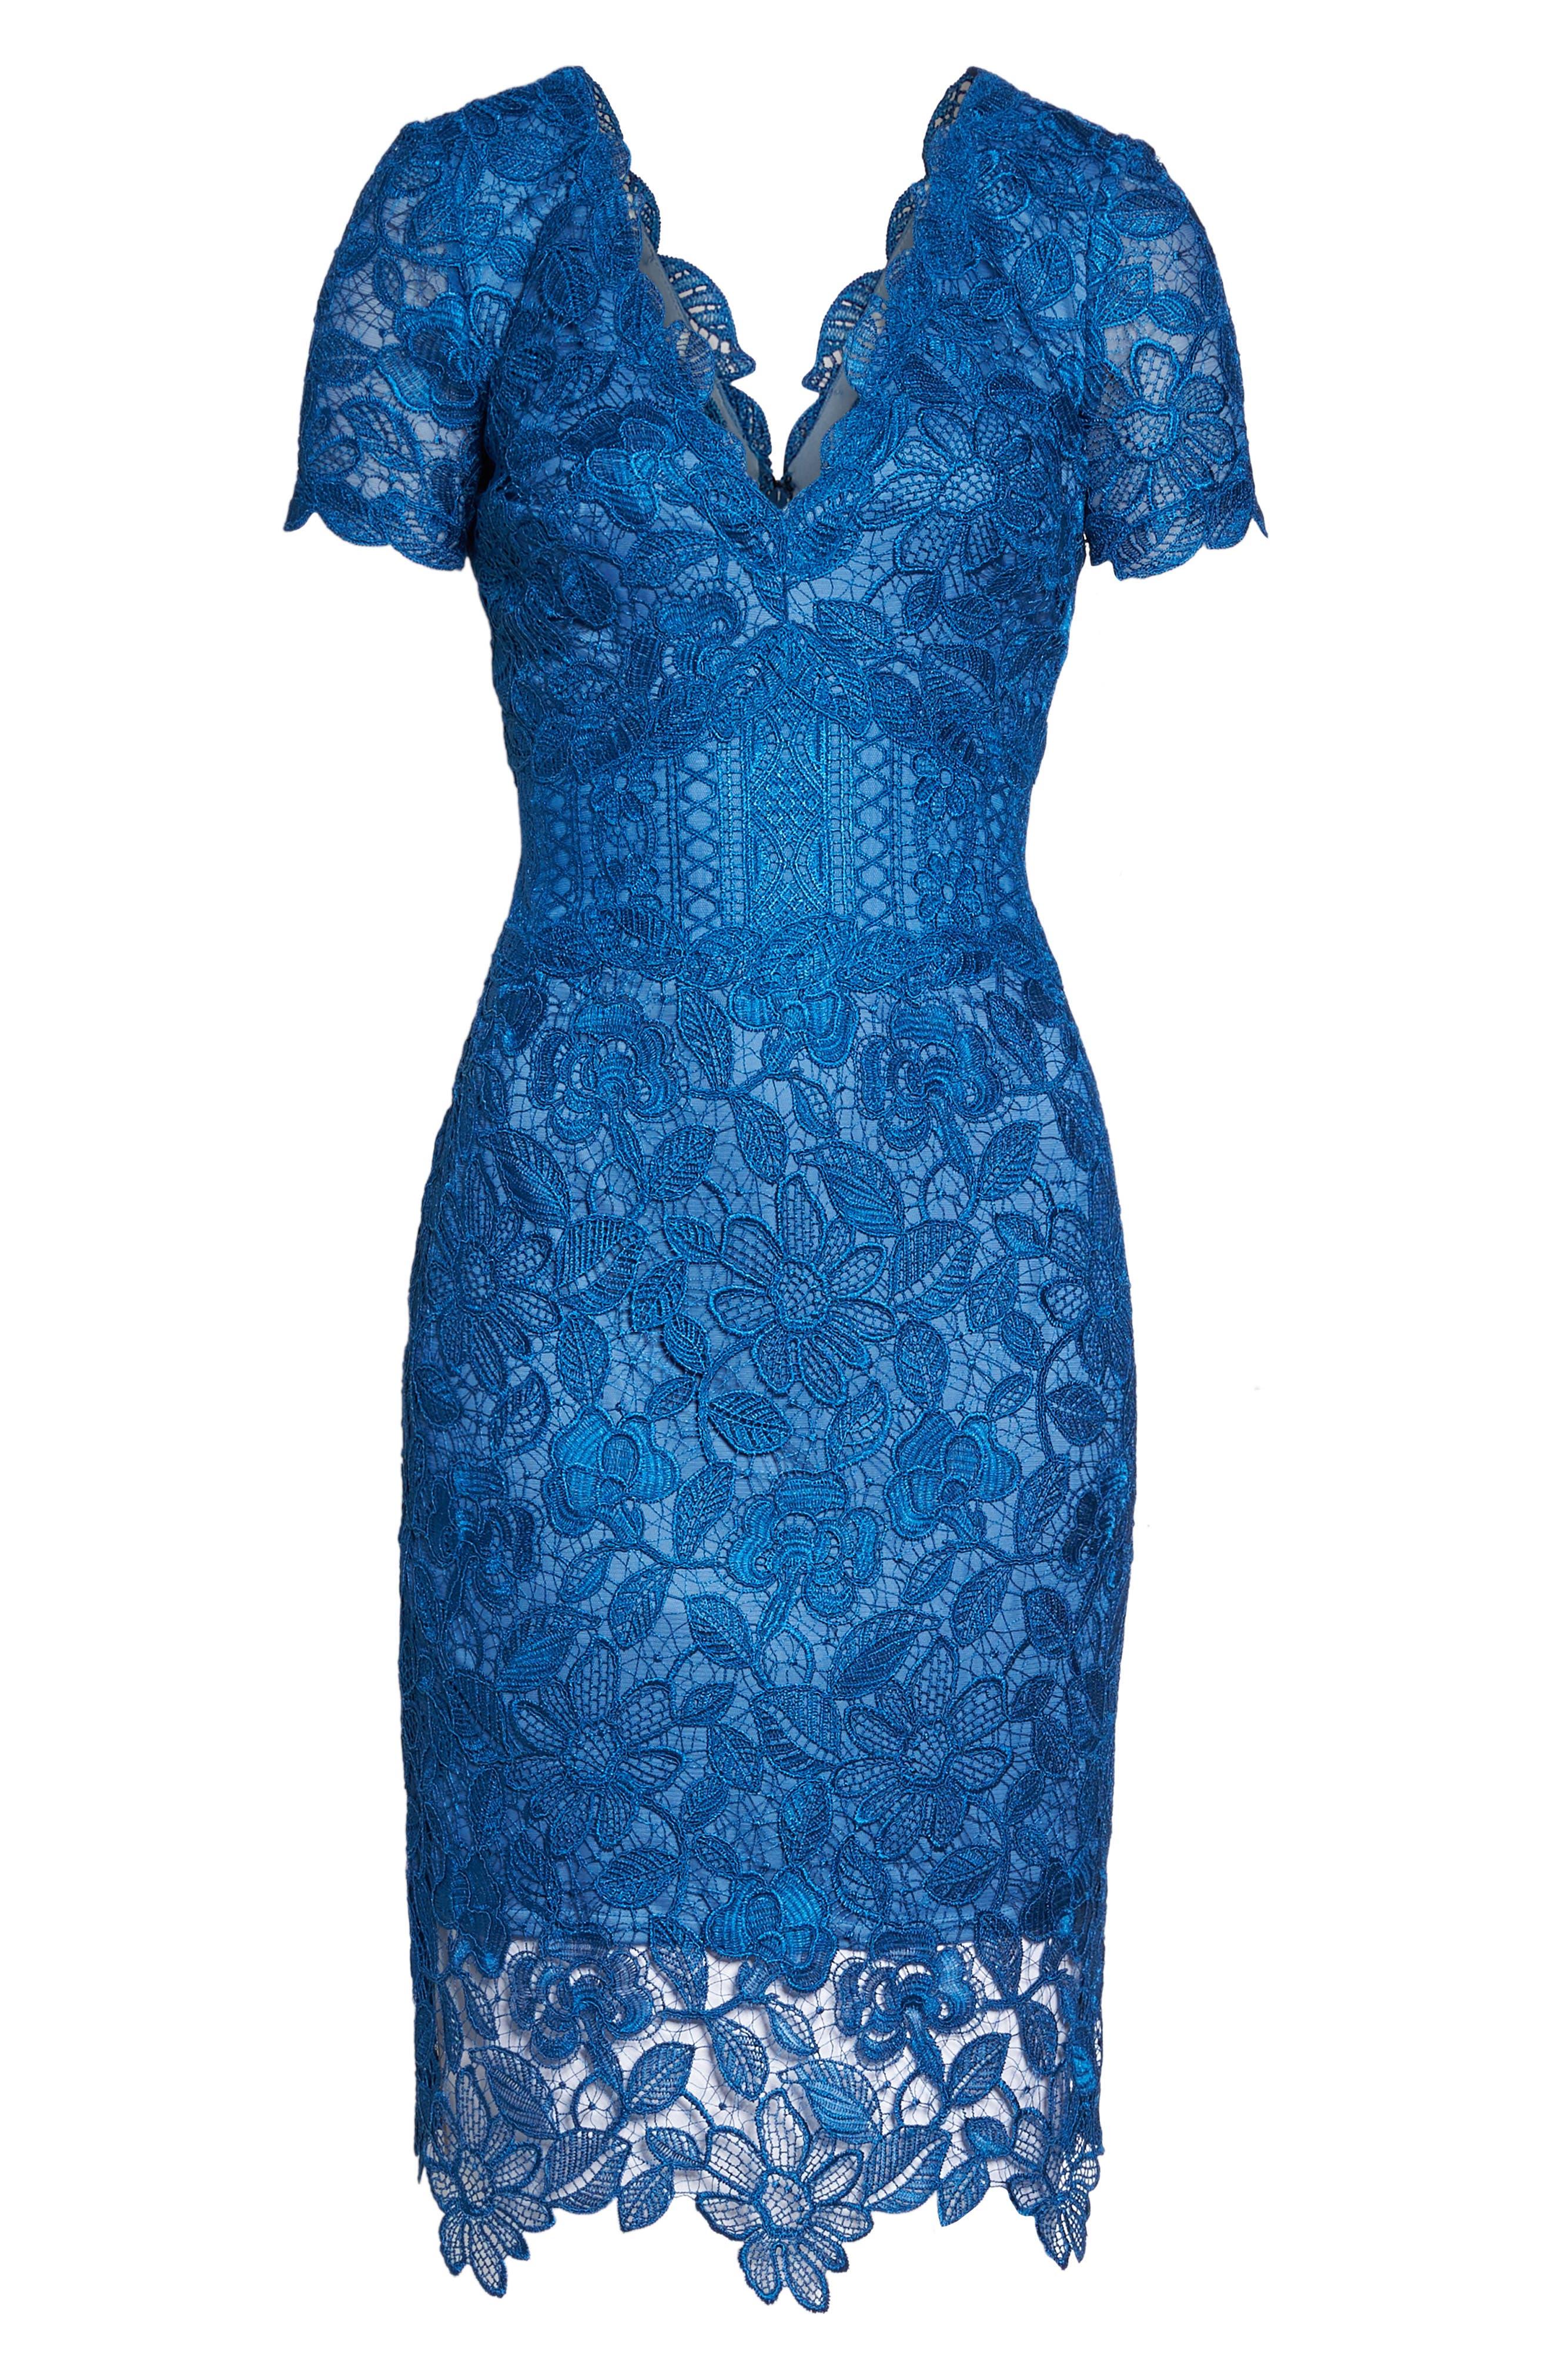 Carter Lace Sheath Dress,                             Alternate thumbnail 6, color,                             Azure